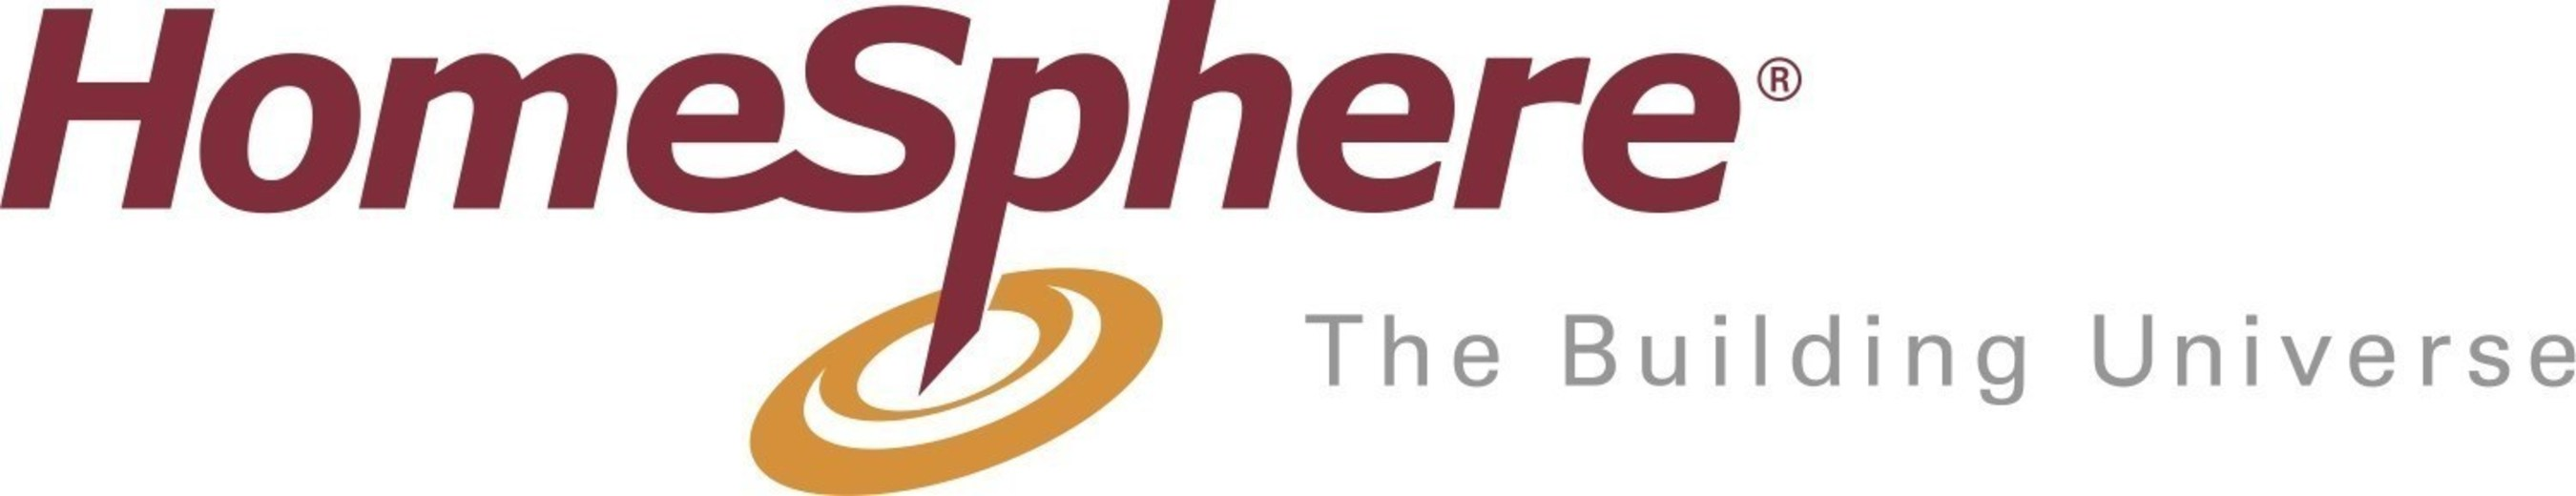 Worldwide Leader in Home Storage and Organization Joins HomeSphere BRI Network